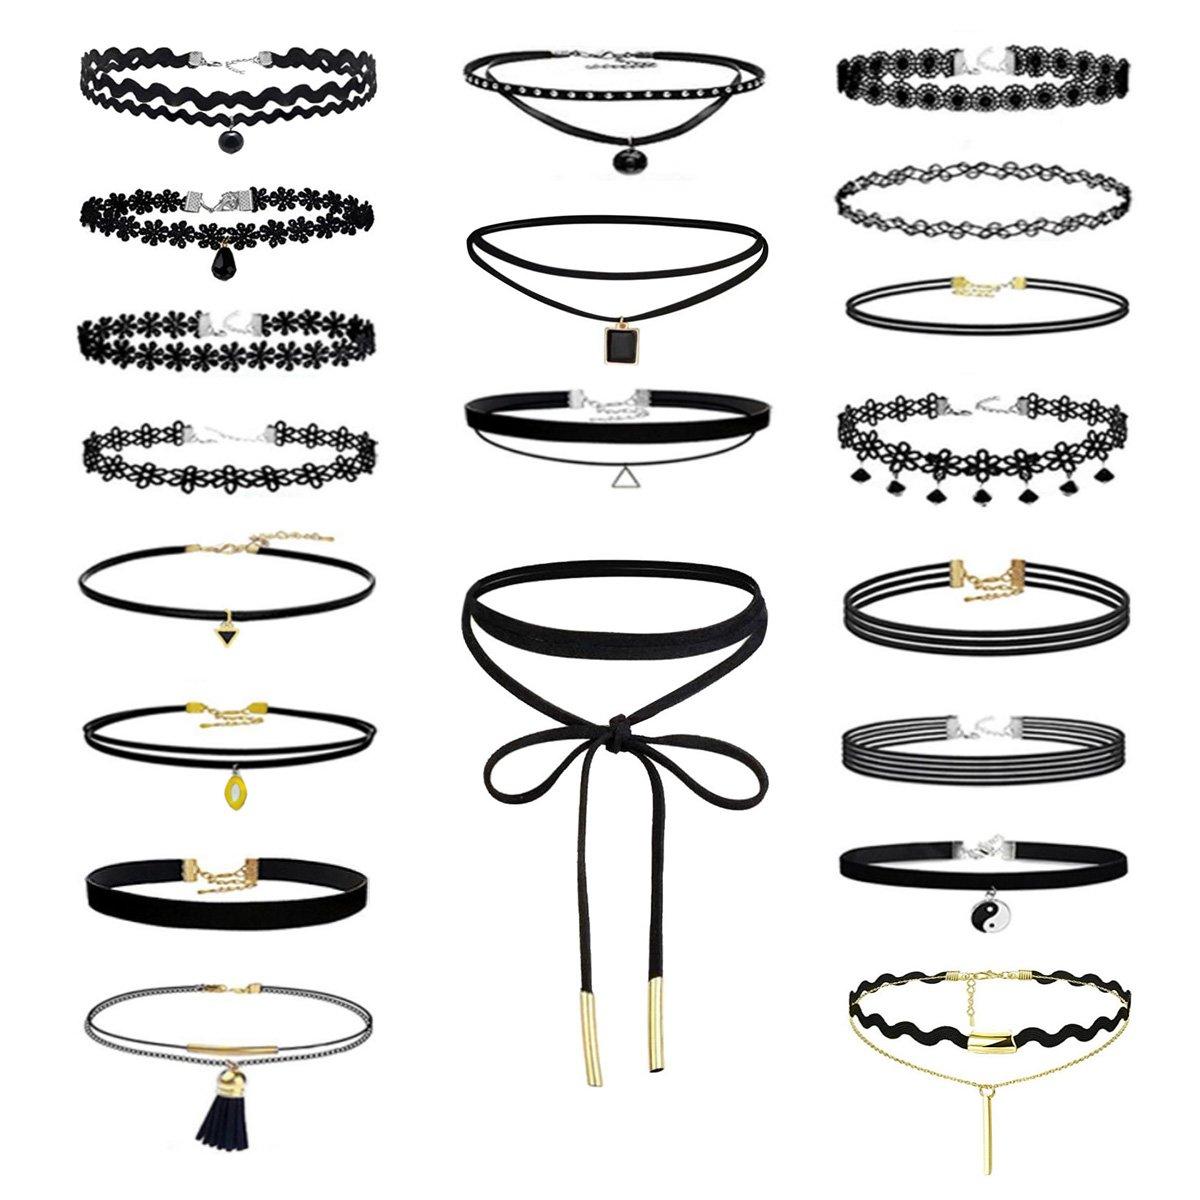 Eigso 20Pcs Girls Womens Velvet Ribbon Necklace Gothic Tattoo Lace Choker Henna Elastic Choker Set Adjustable